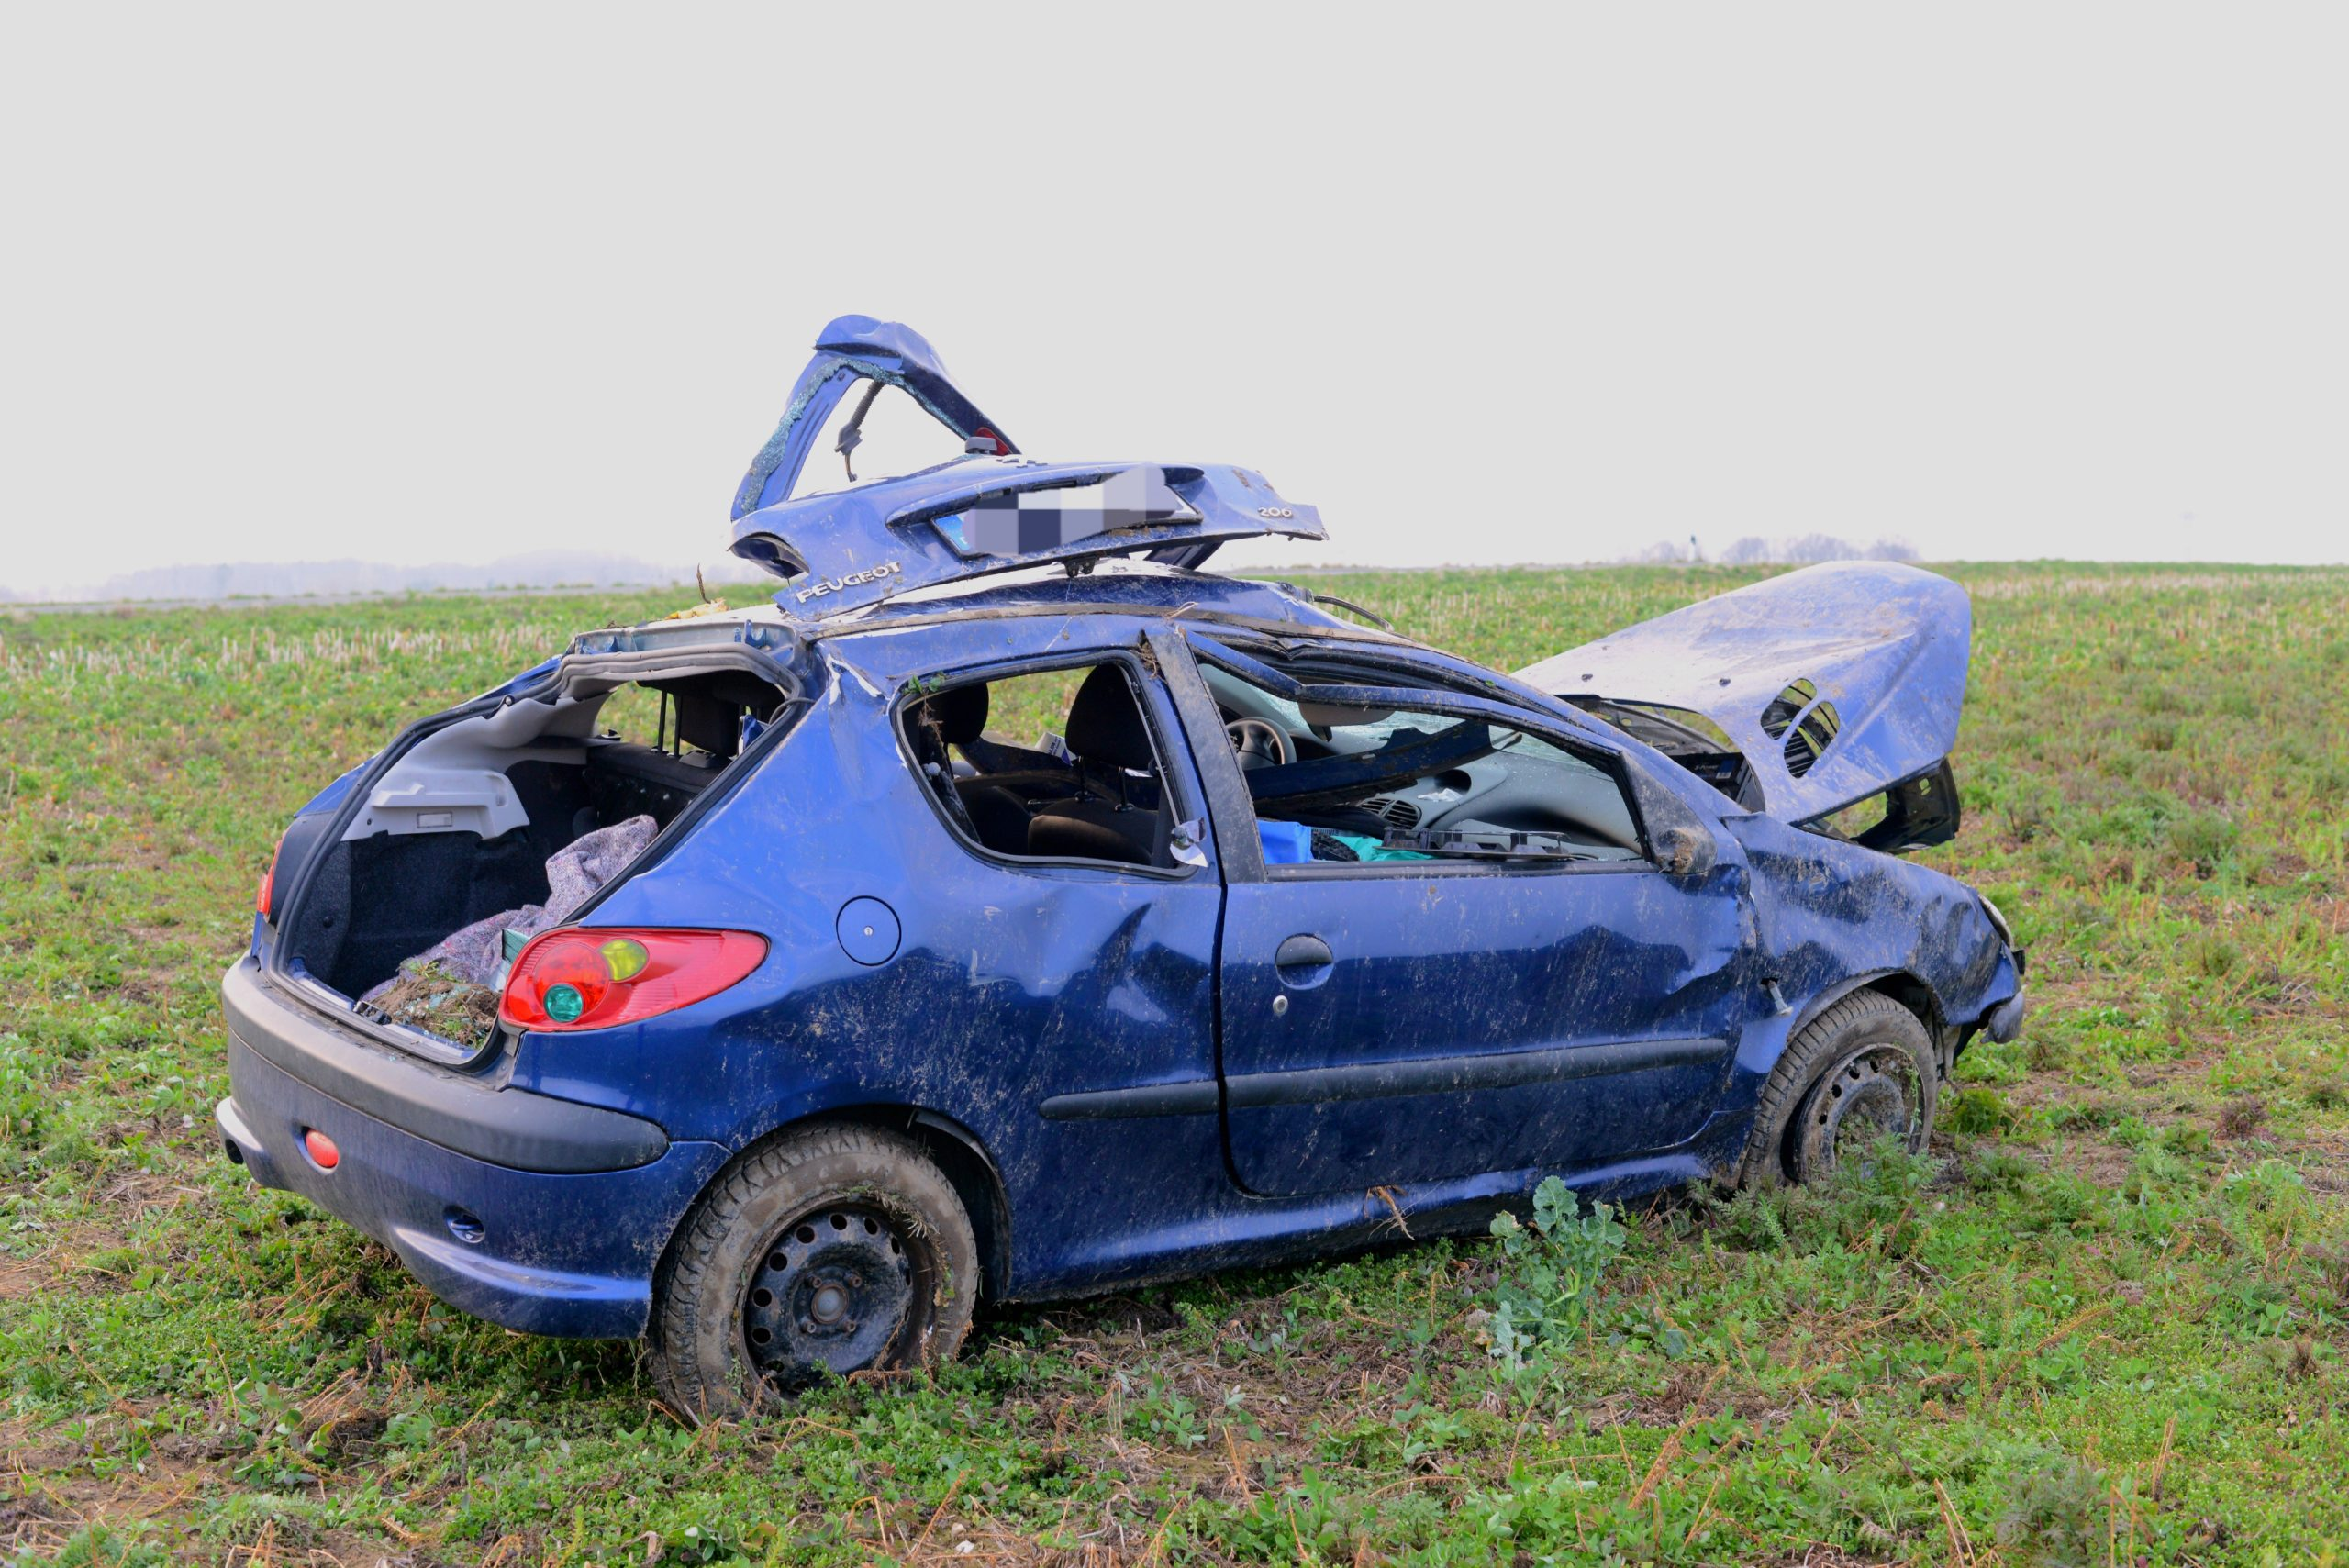 Radibor-Fahrzeug-berschl-gt-sich-mehrfach